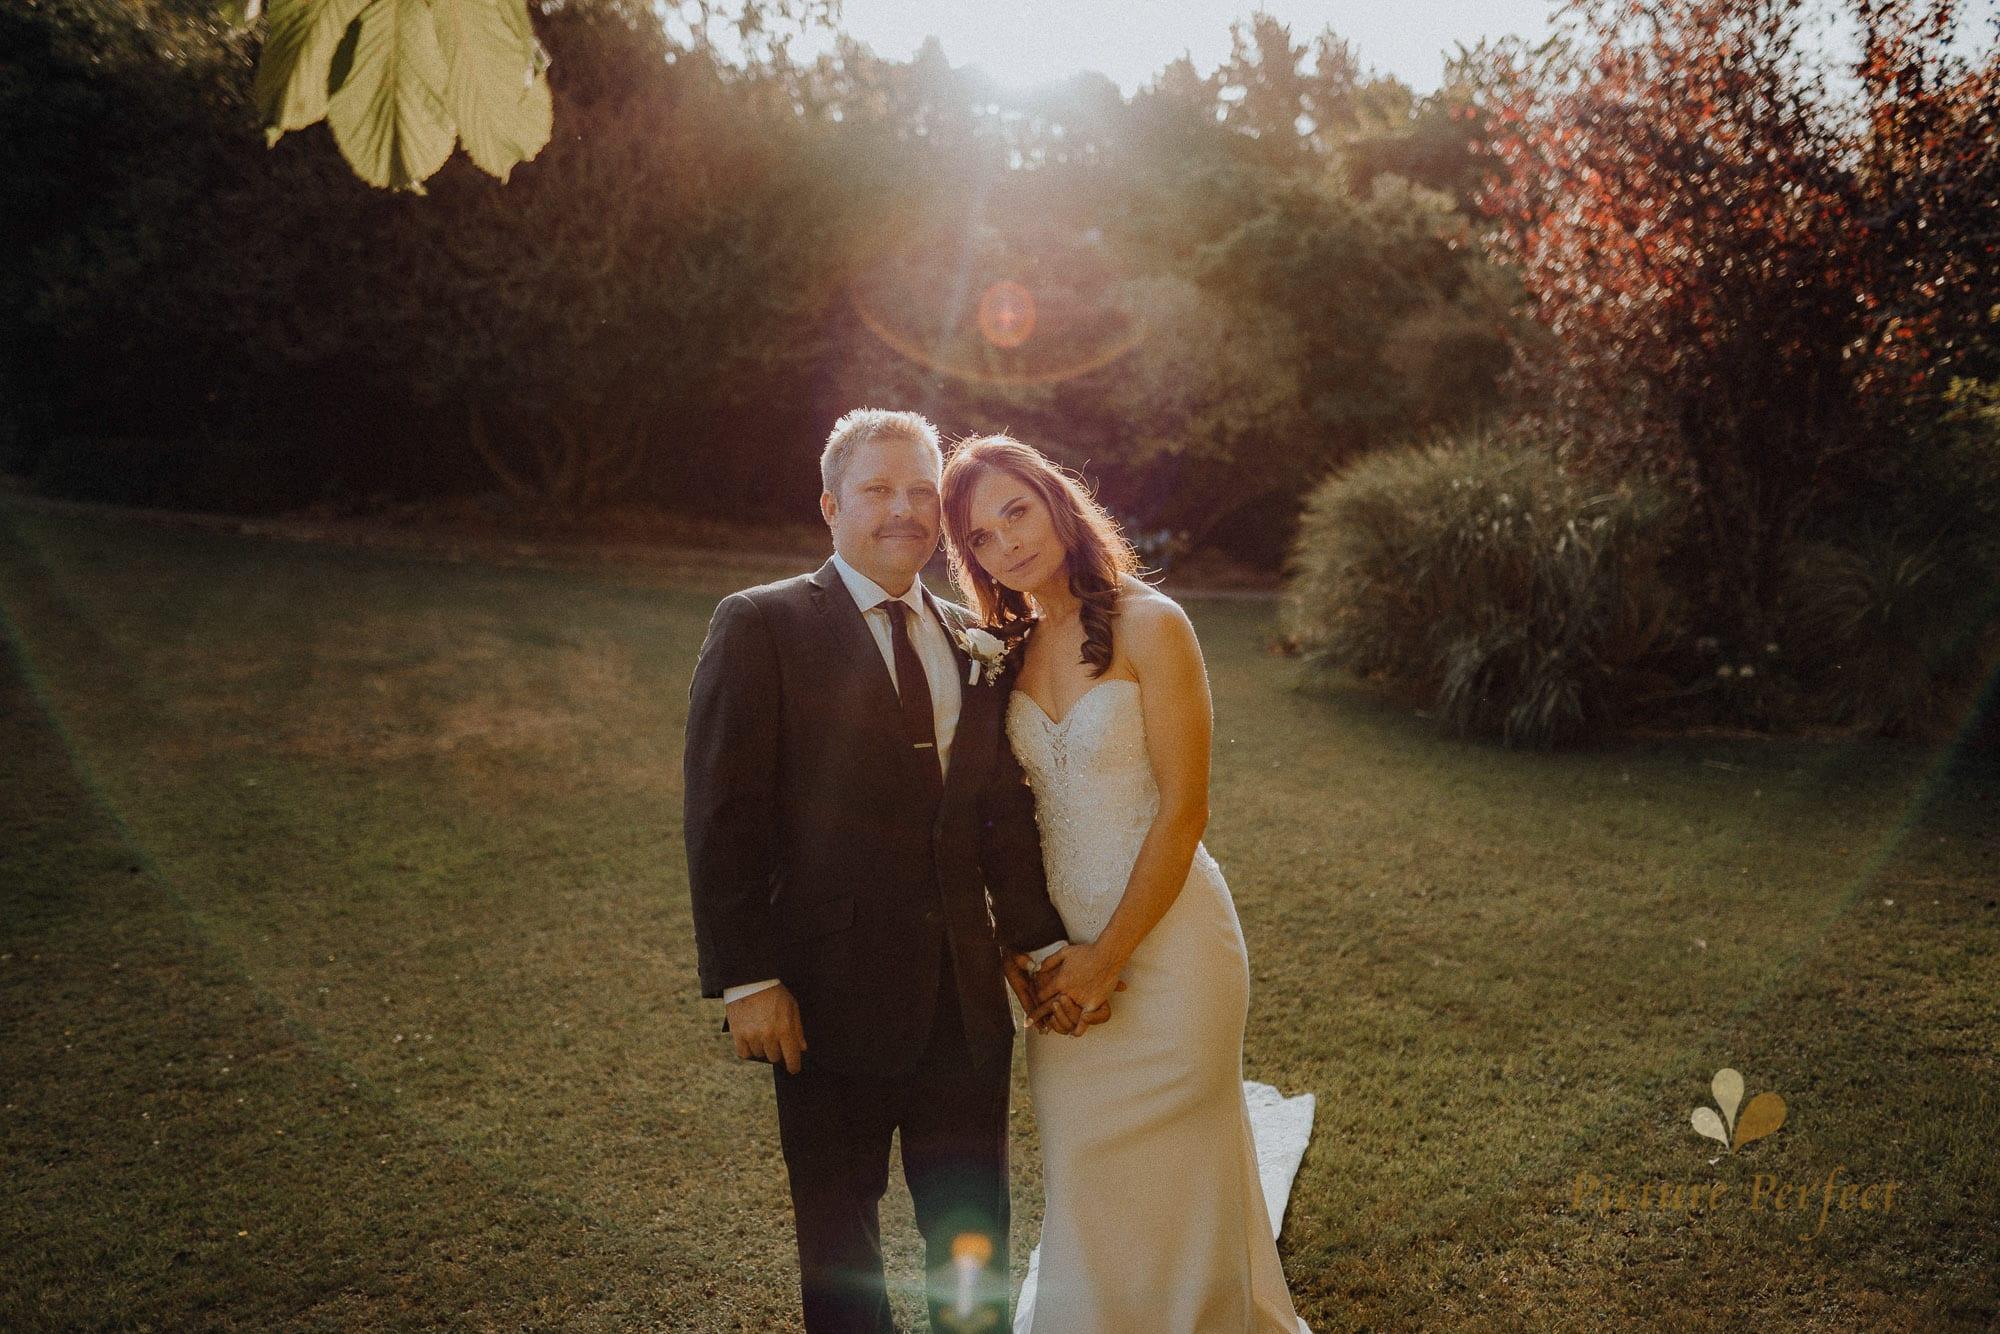 Roseburb Park wedding of Casey 4774